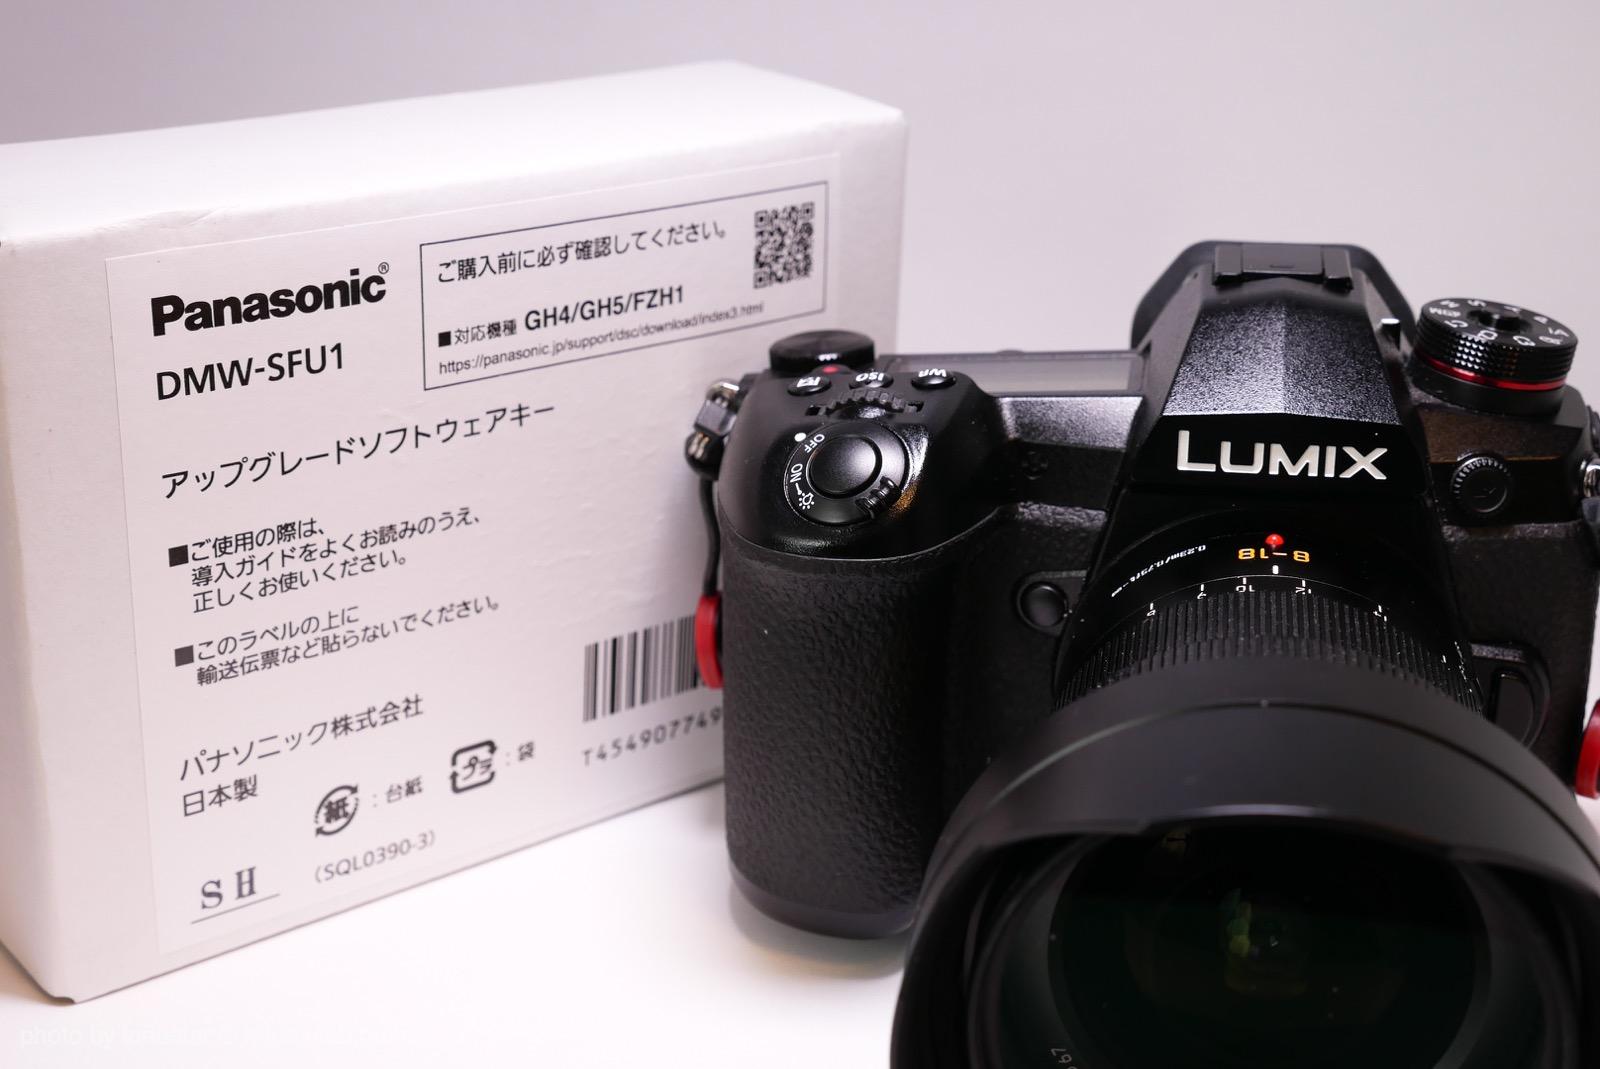 LUMIX G9 PRO DMW-SFU1